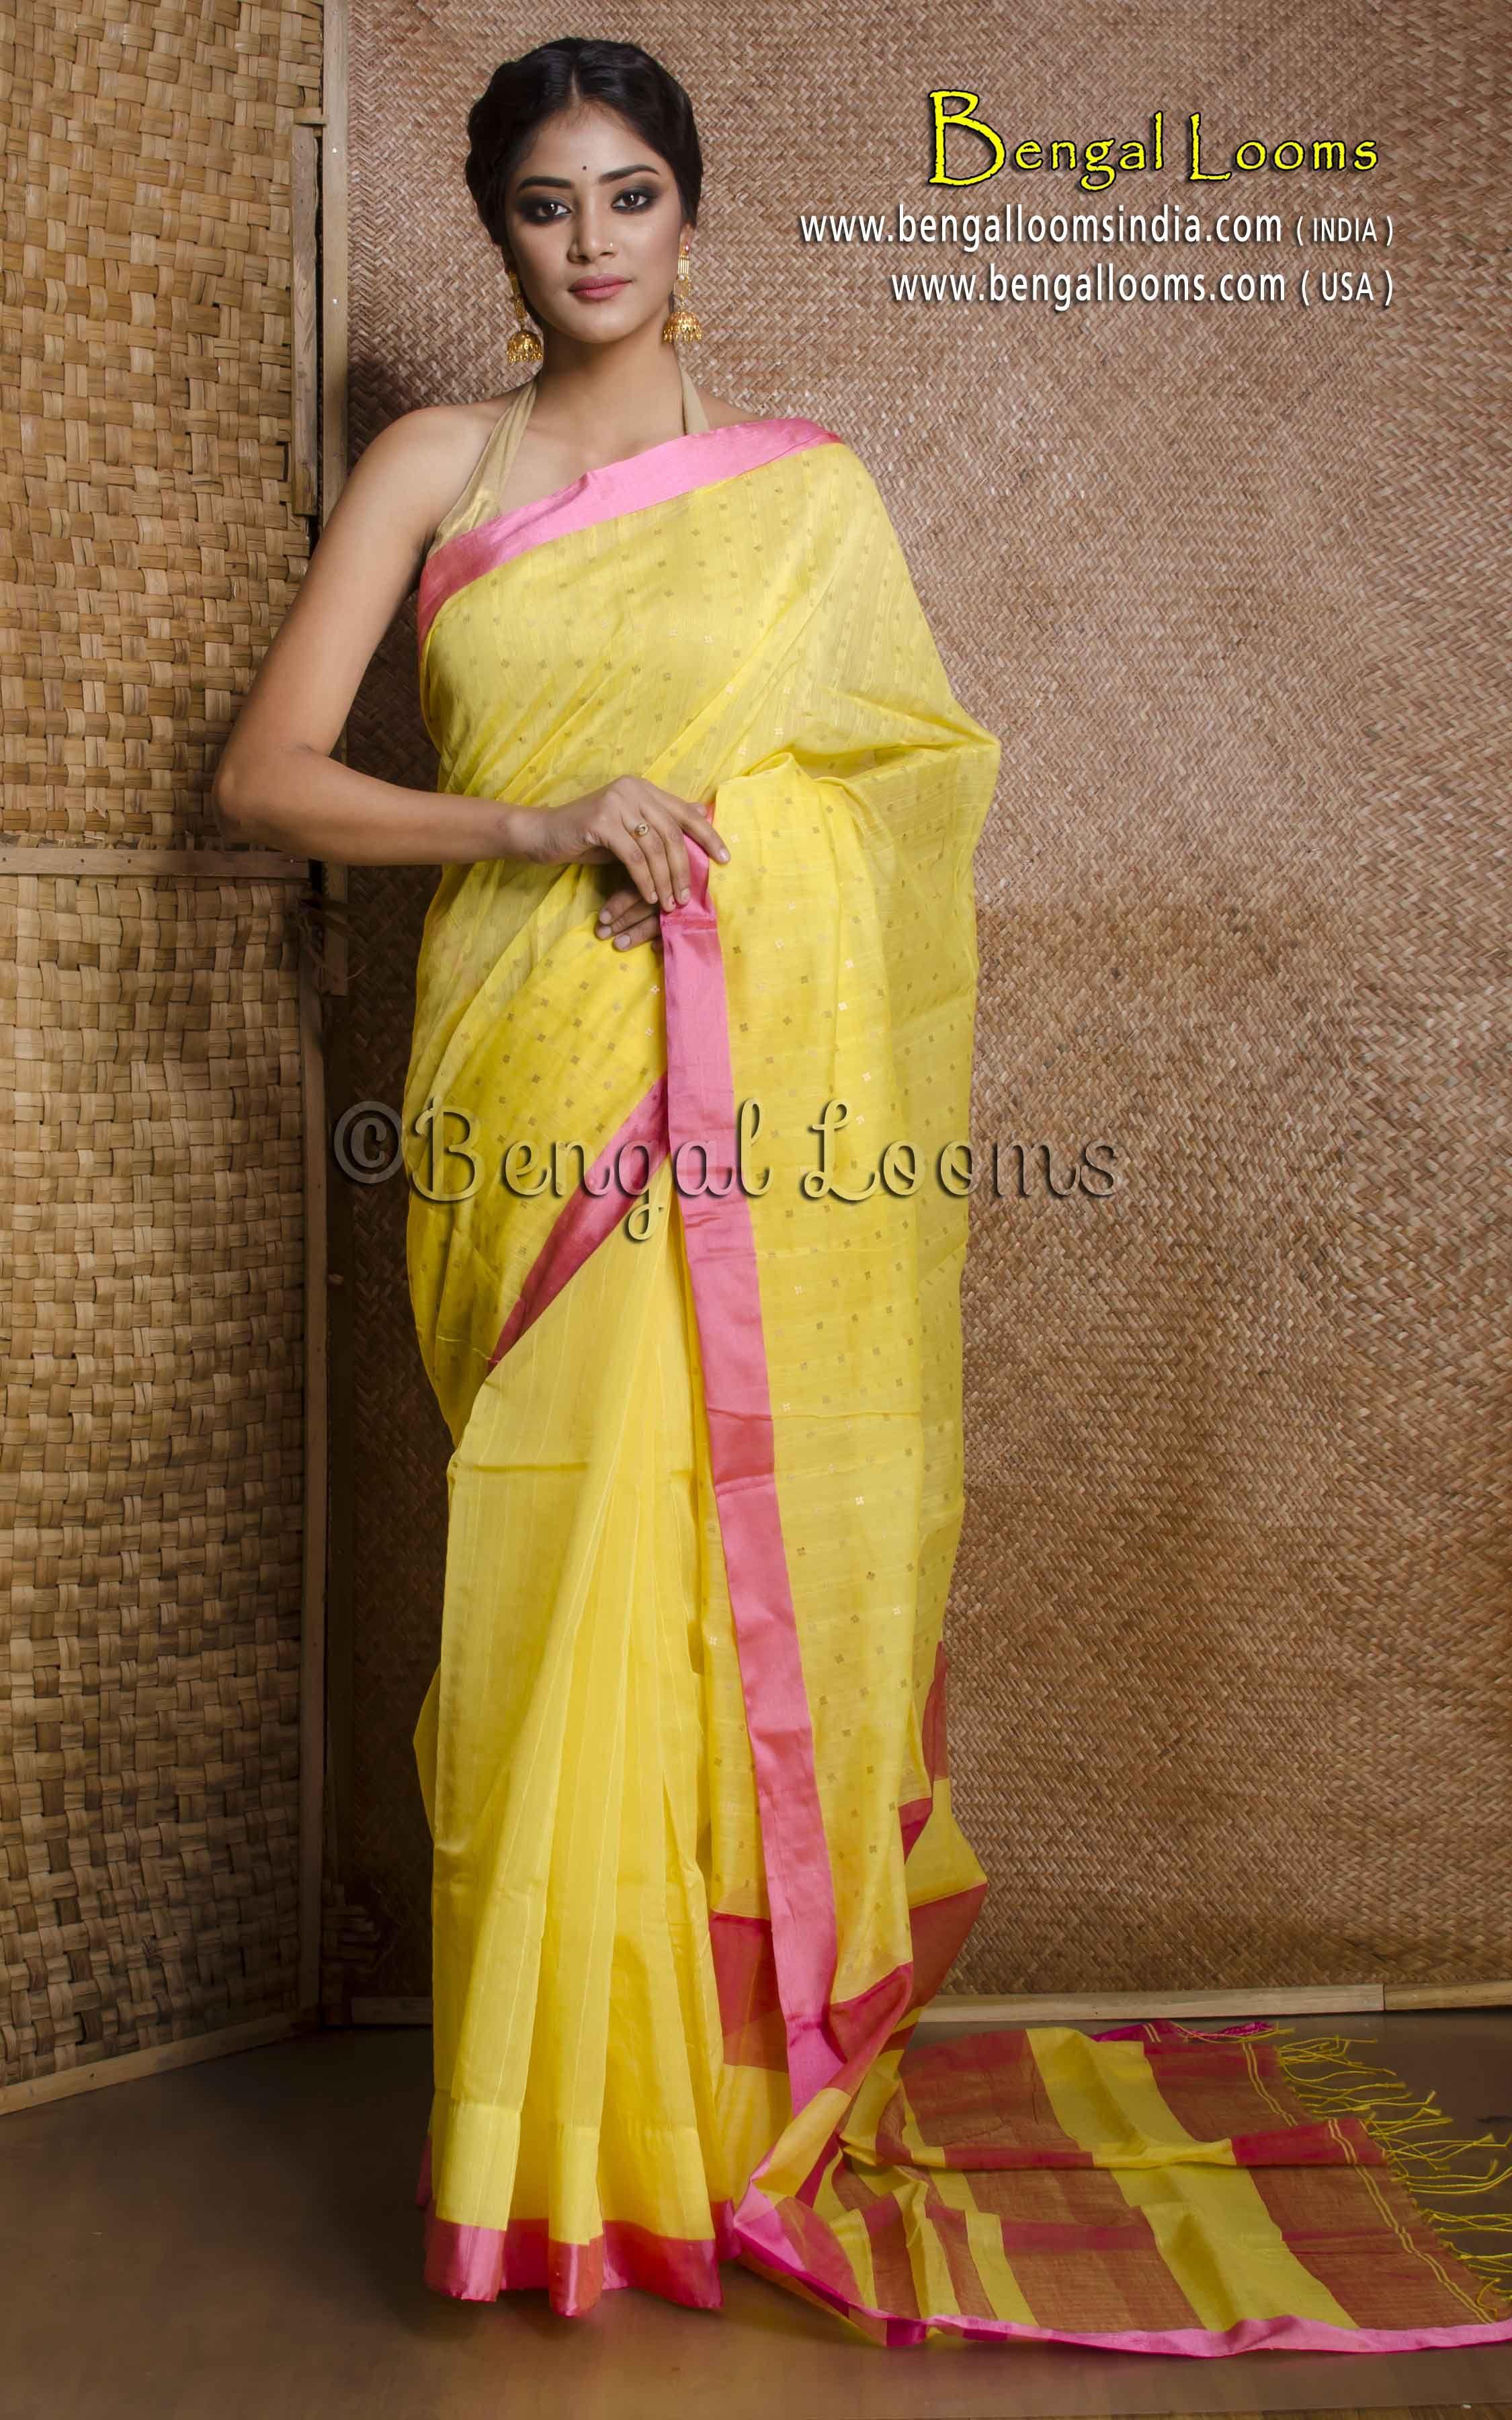 56dbd401b5 Pure Handloom Khadi Soft Cotton Saree with Sequin Work in Yellow and Rani